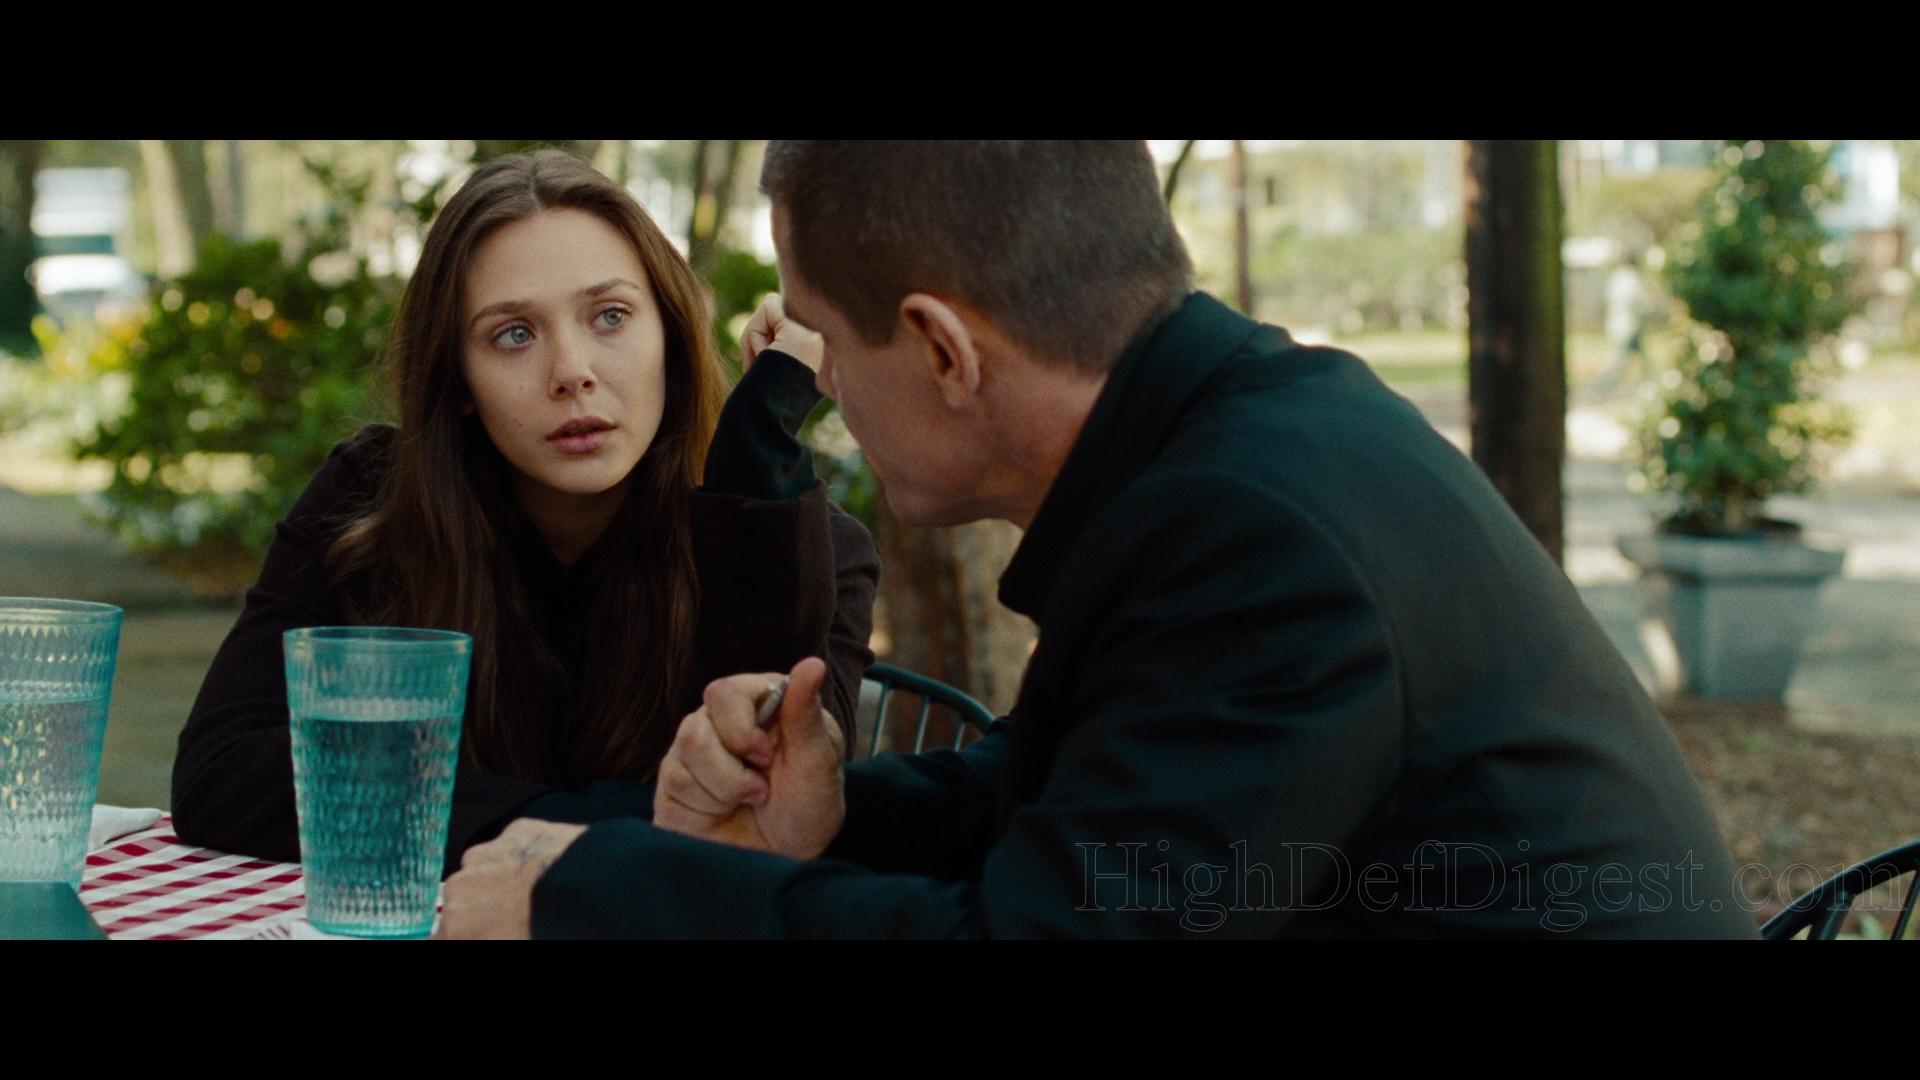 Oldboy 2013 Blu ray Review